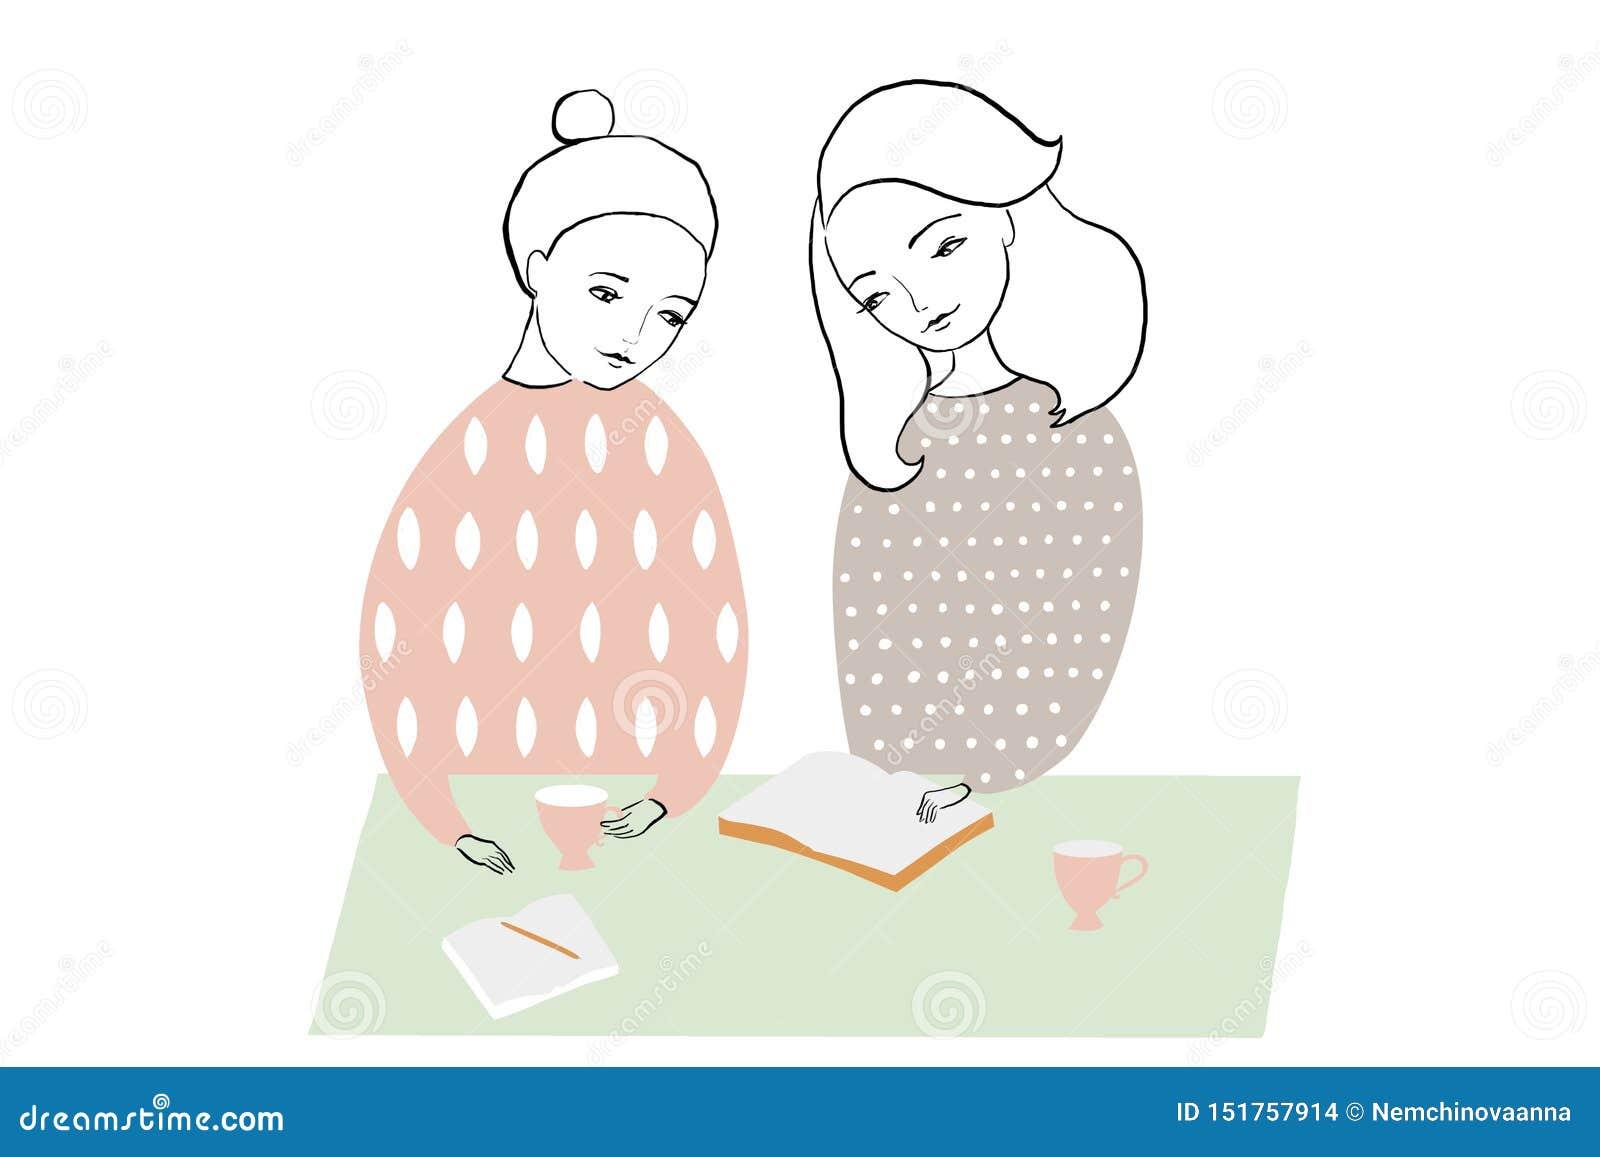 Studing Table Stock Illustrations – 121 Studing Table Stock